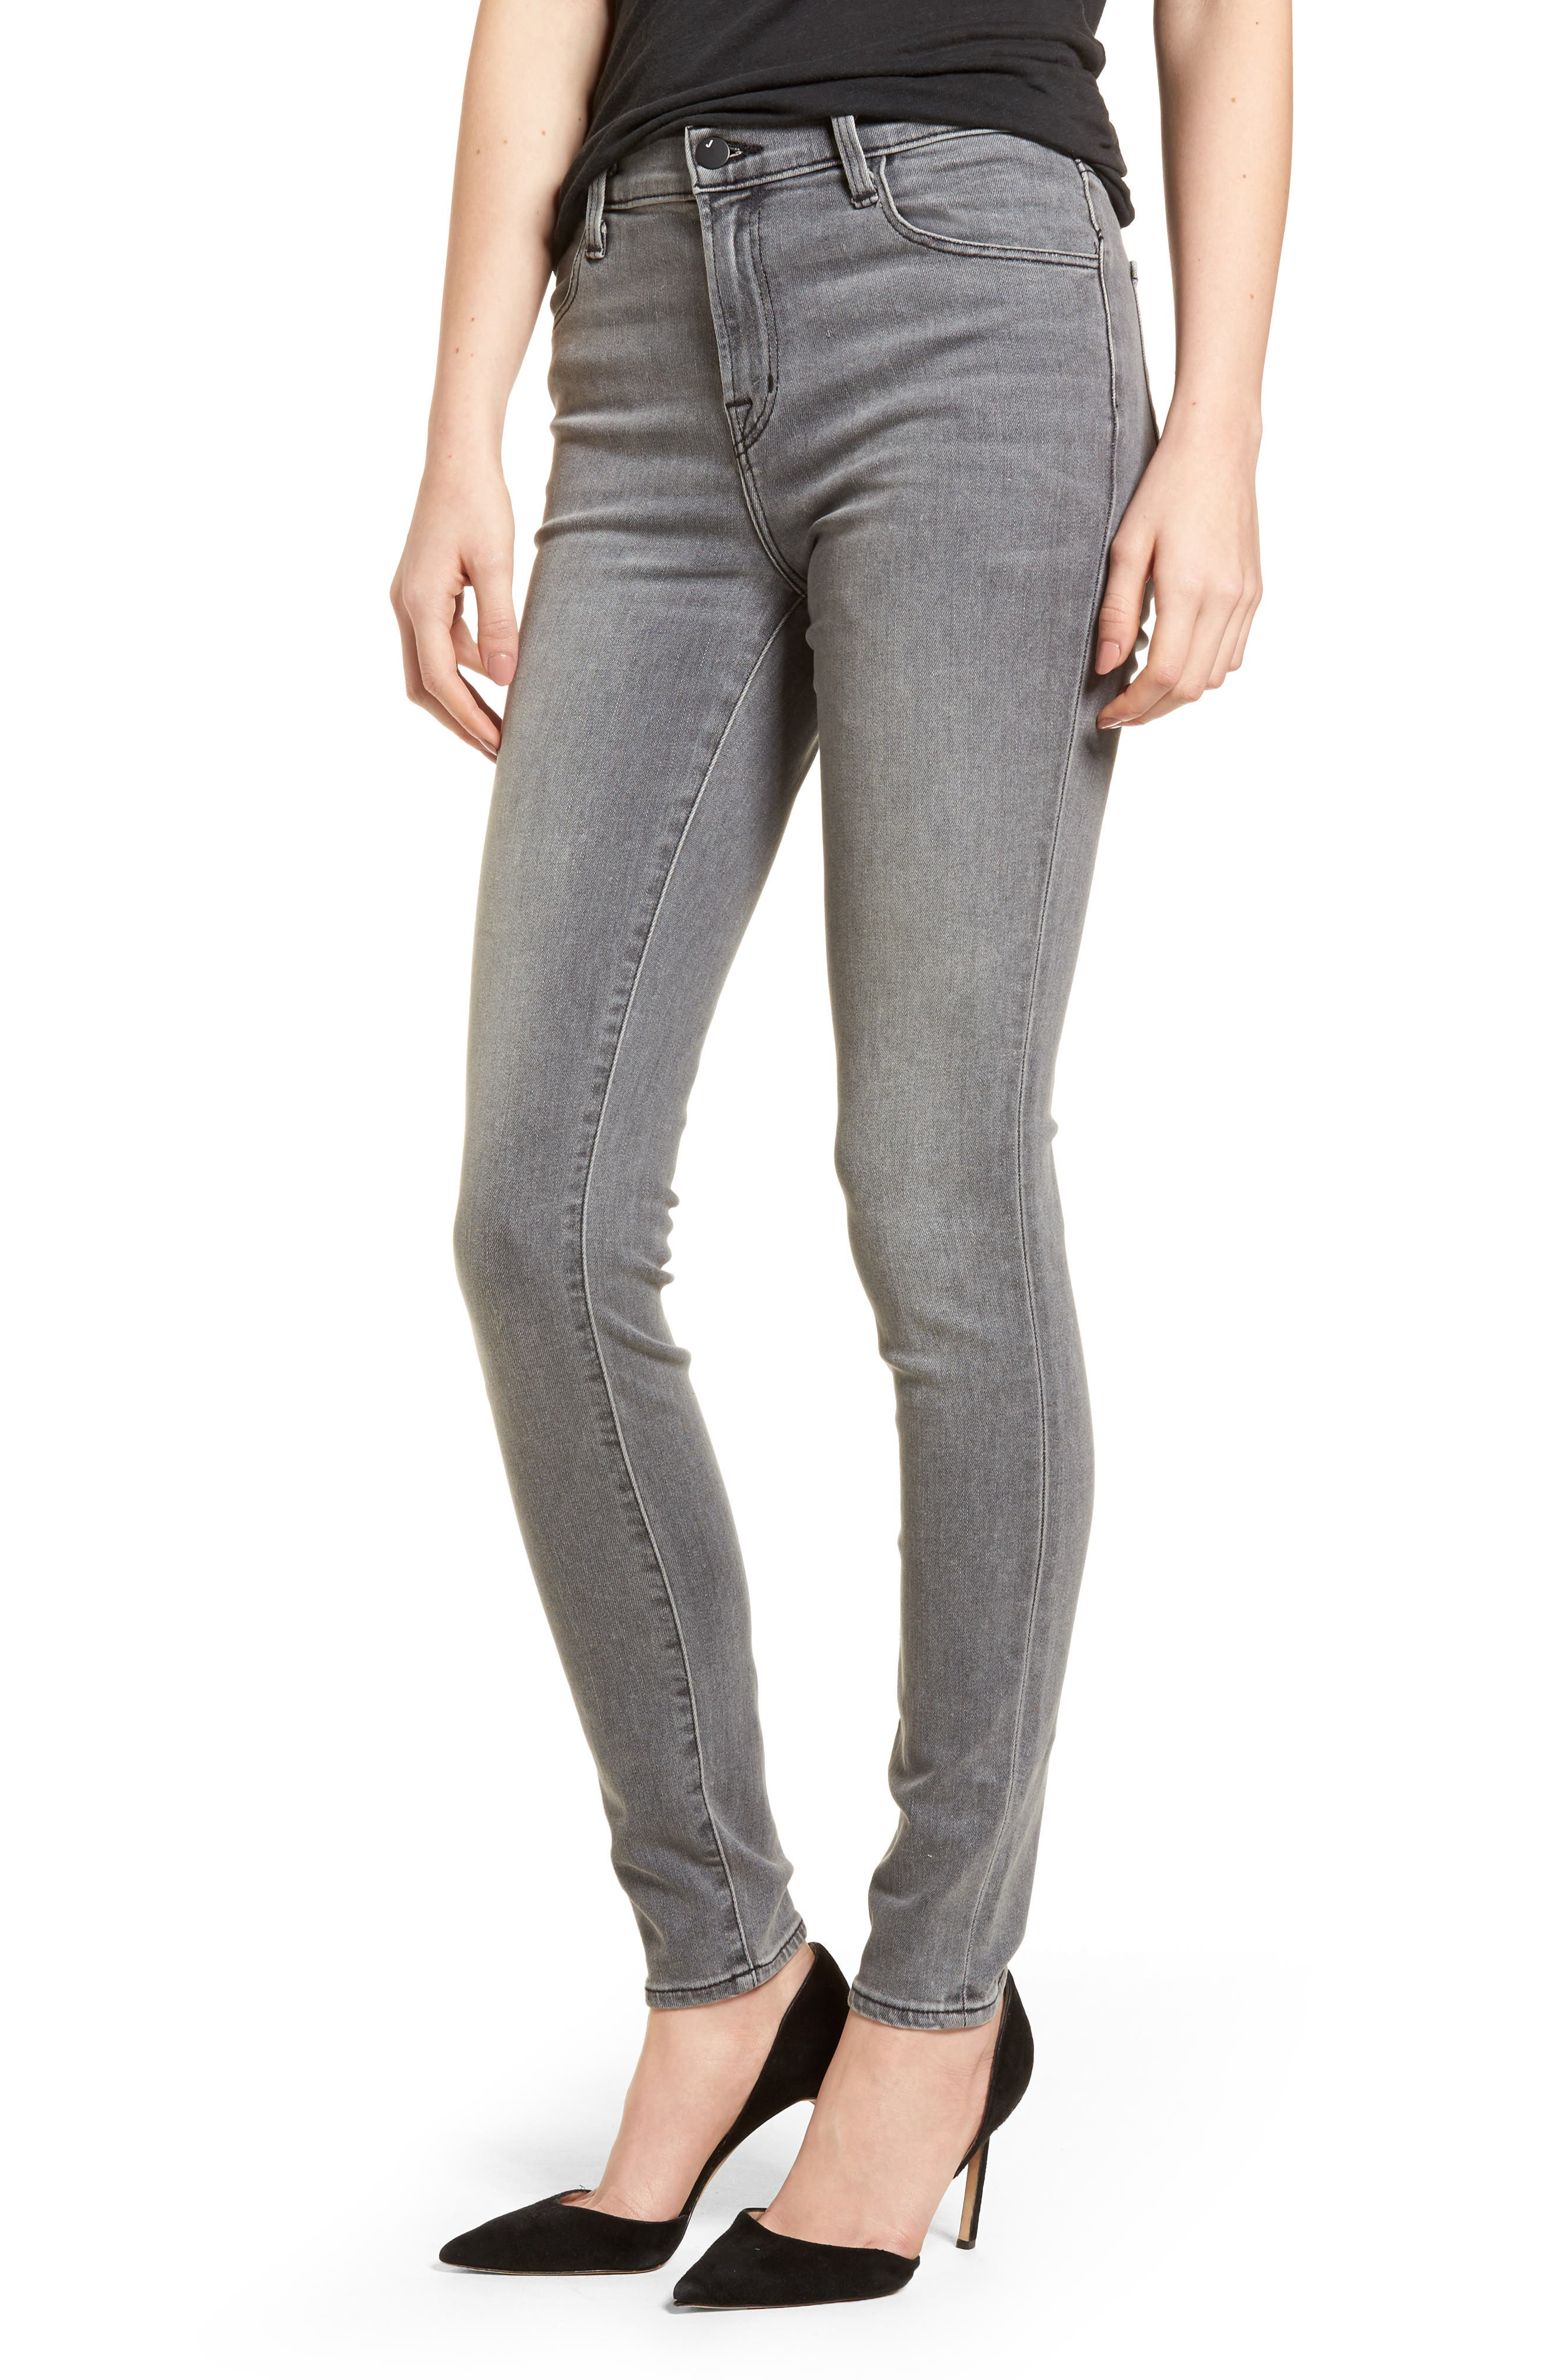 J Brand Maria High Waist Skinny Jeans (Pebble) (Nordstrom Exclusive)